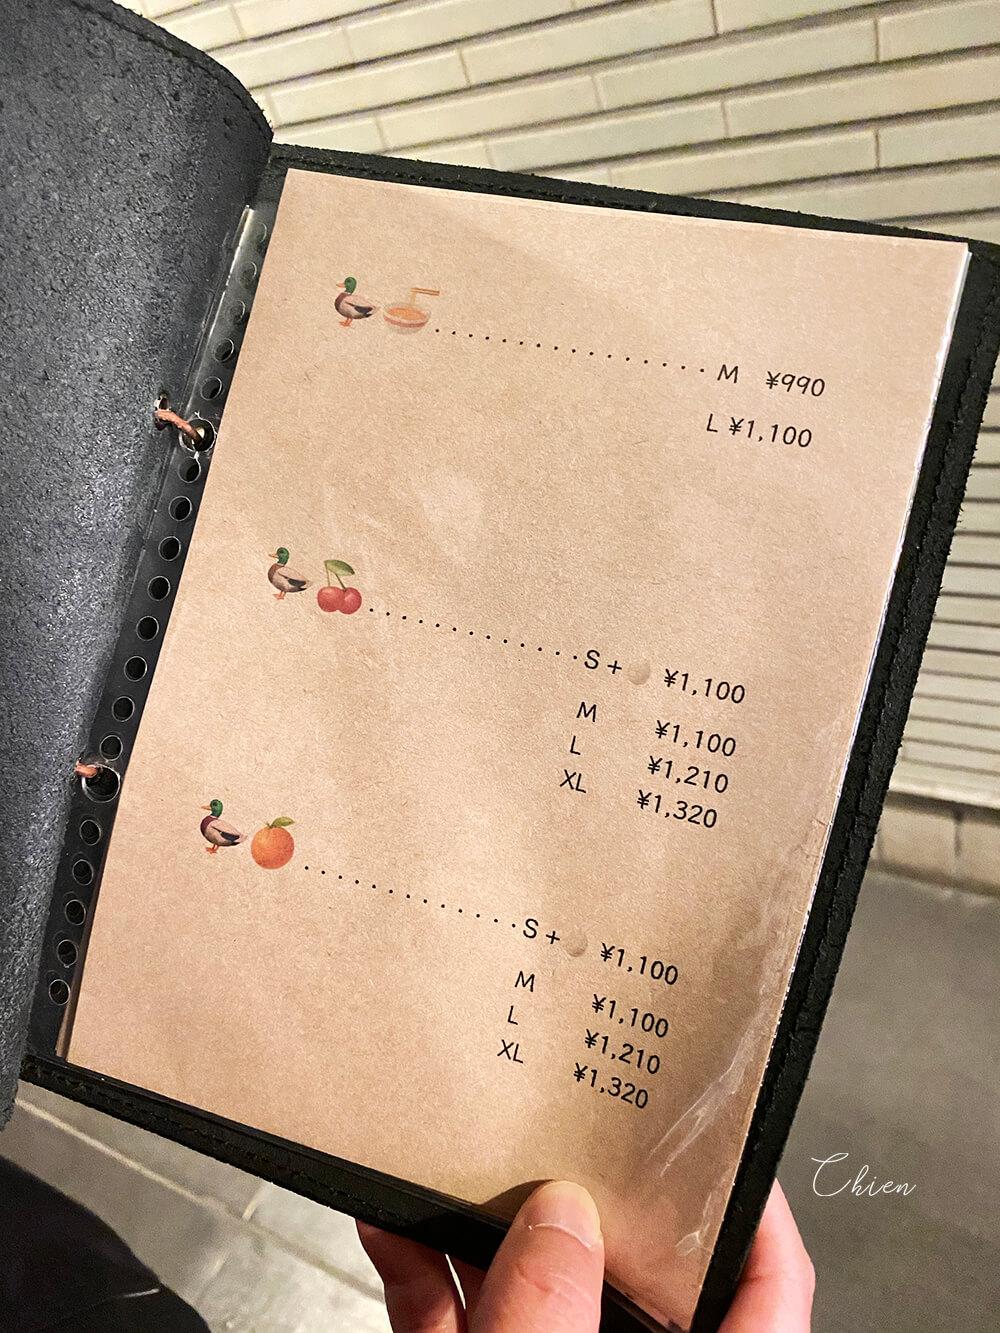 京都祇園拉麵沾麵店 Gion Duck Noodles🦆🍜 菜單內容